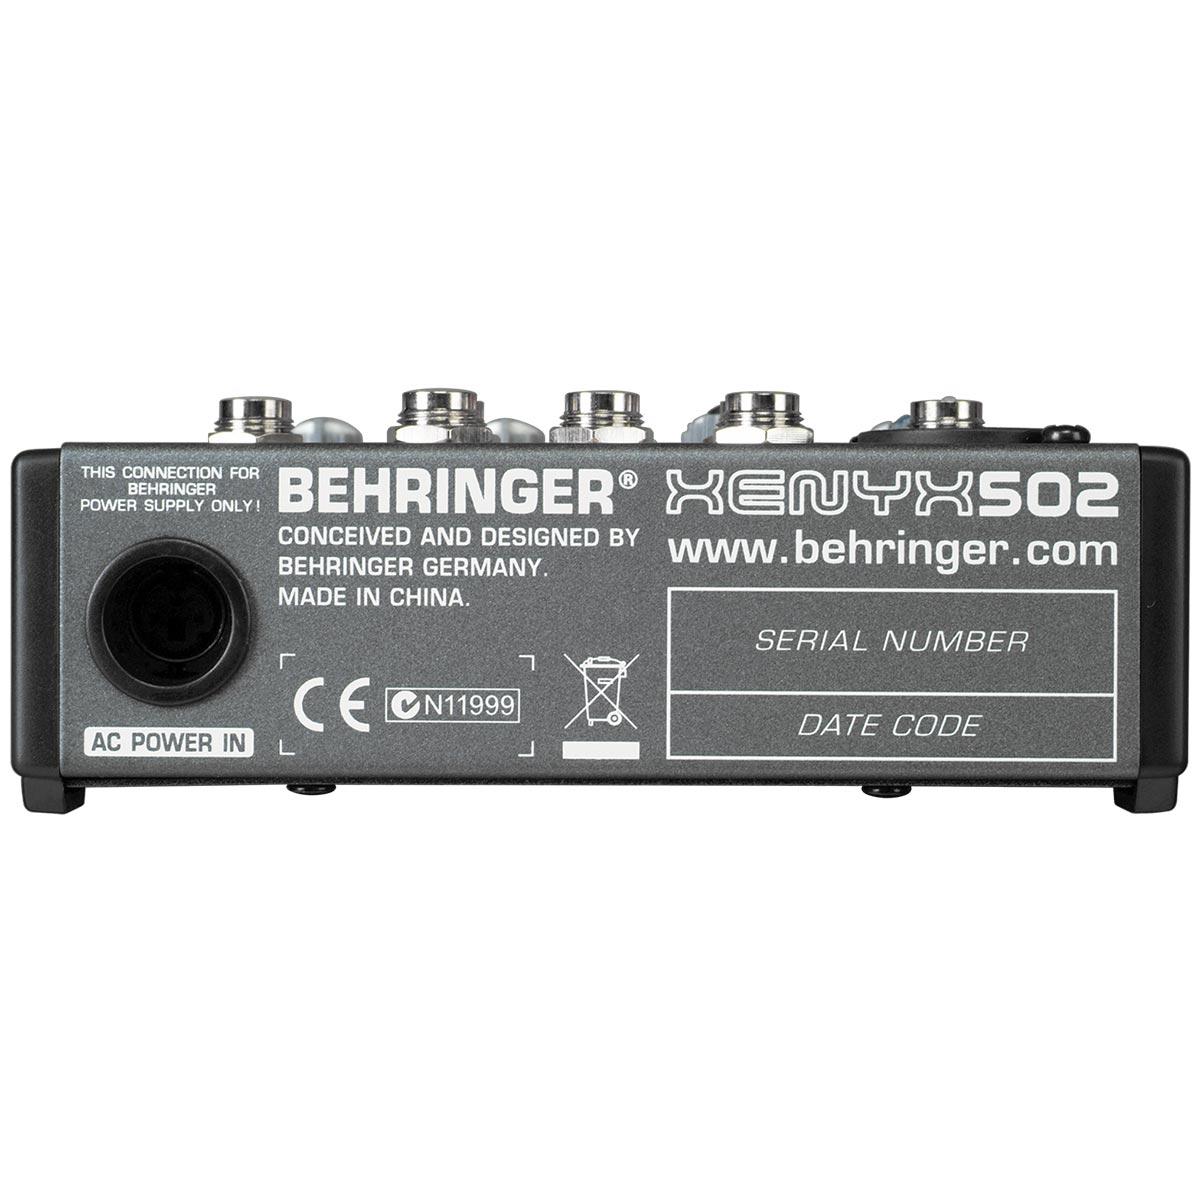 Mesa de Som 5 Canais Balanceados (1 XLR + 4 P10) c/ 1 Auxiliar - Xenyx 502 Behringer